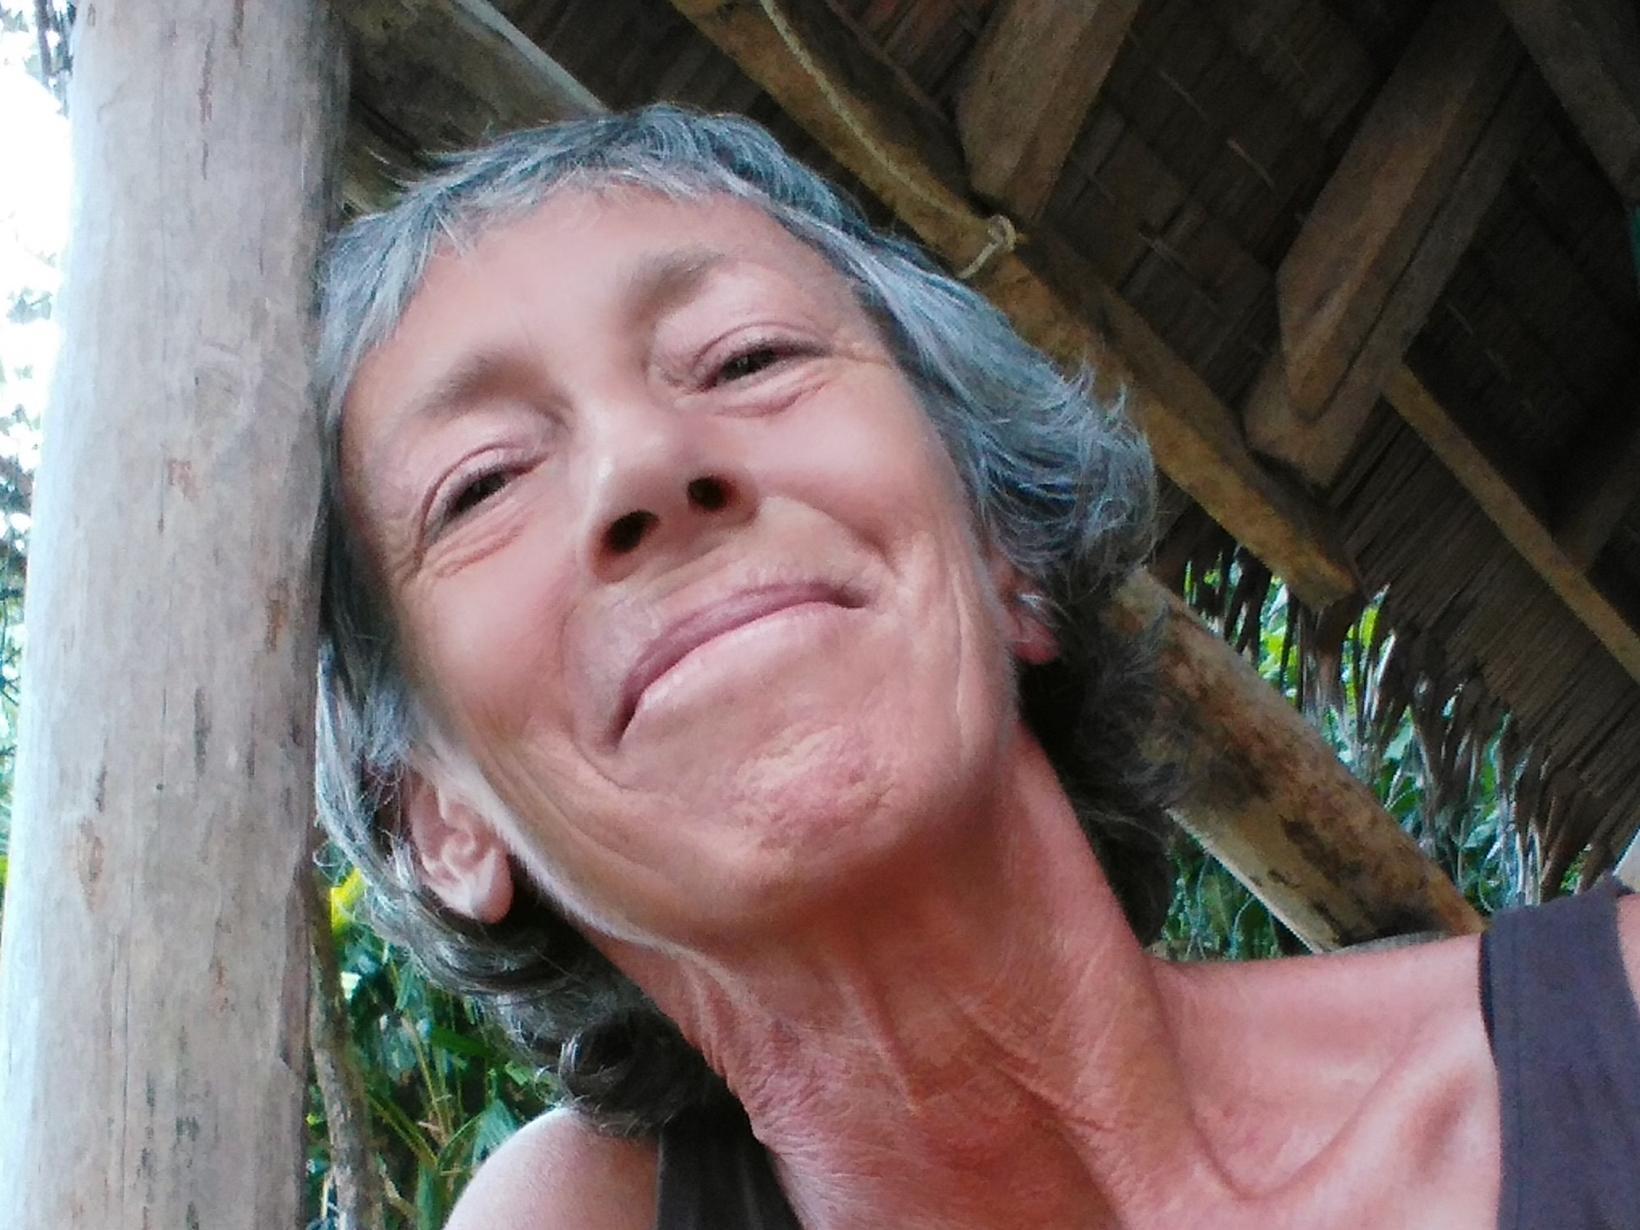 Sarita (ginny) from Sydney, New South Wales, Australia